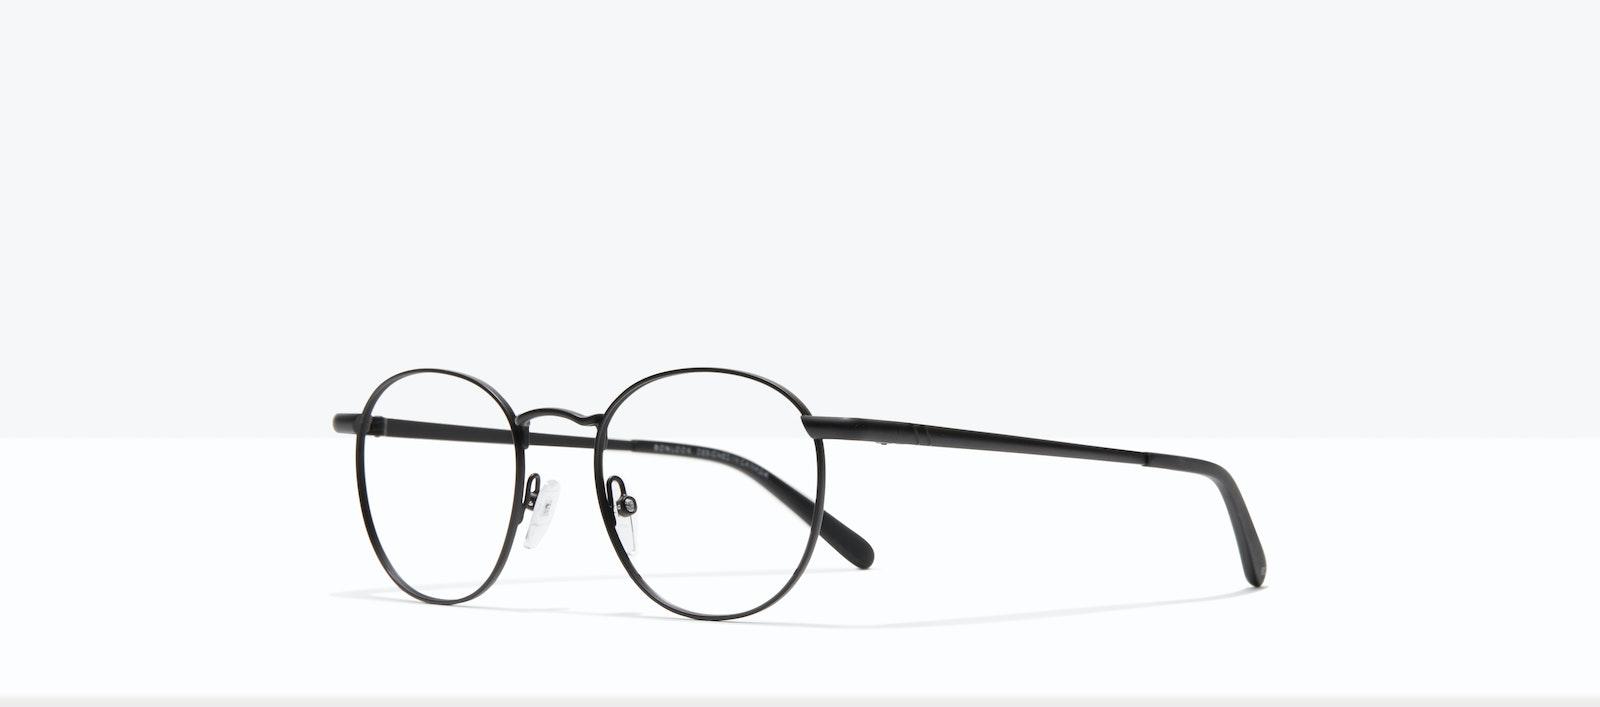 Affordable Fashion Glasses Round Eyeglasses Men Women Divine Matte Black Tilt